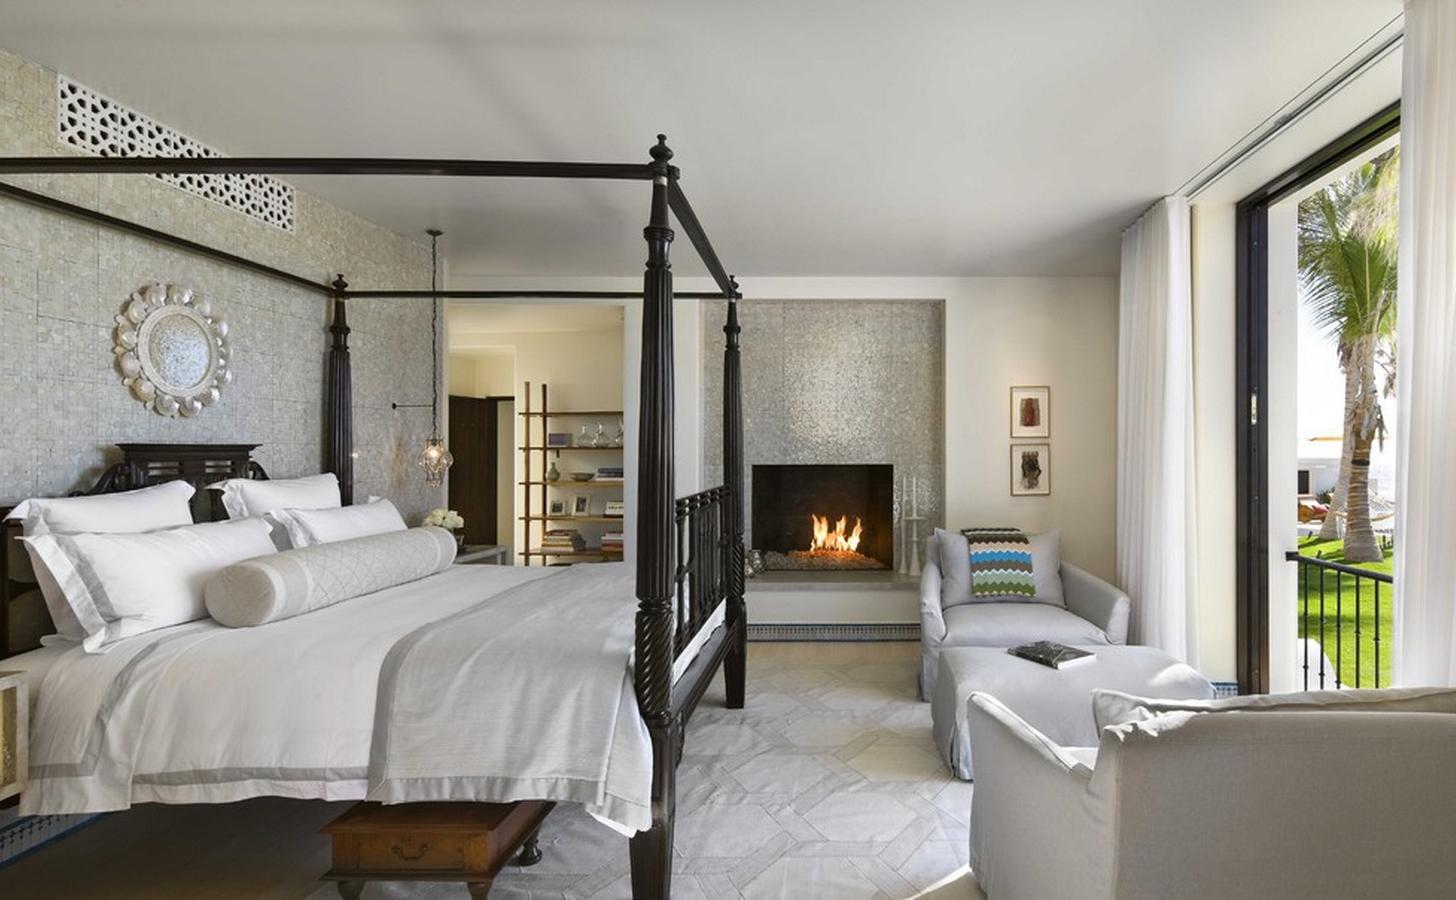 Elegant Master Bedroom Designs: 29+ Elegant Master Bedroom Designs, Decorating Ideas